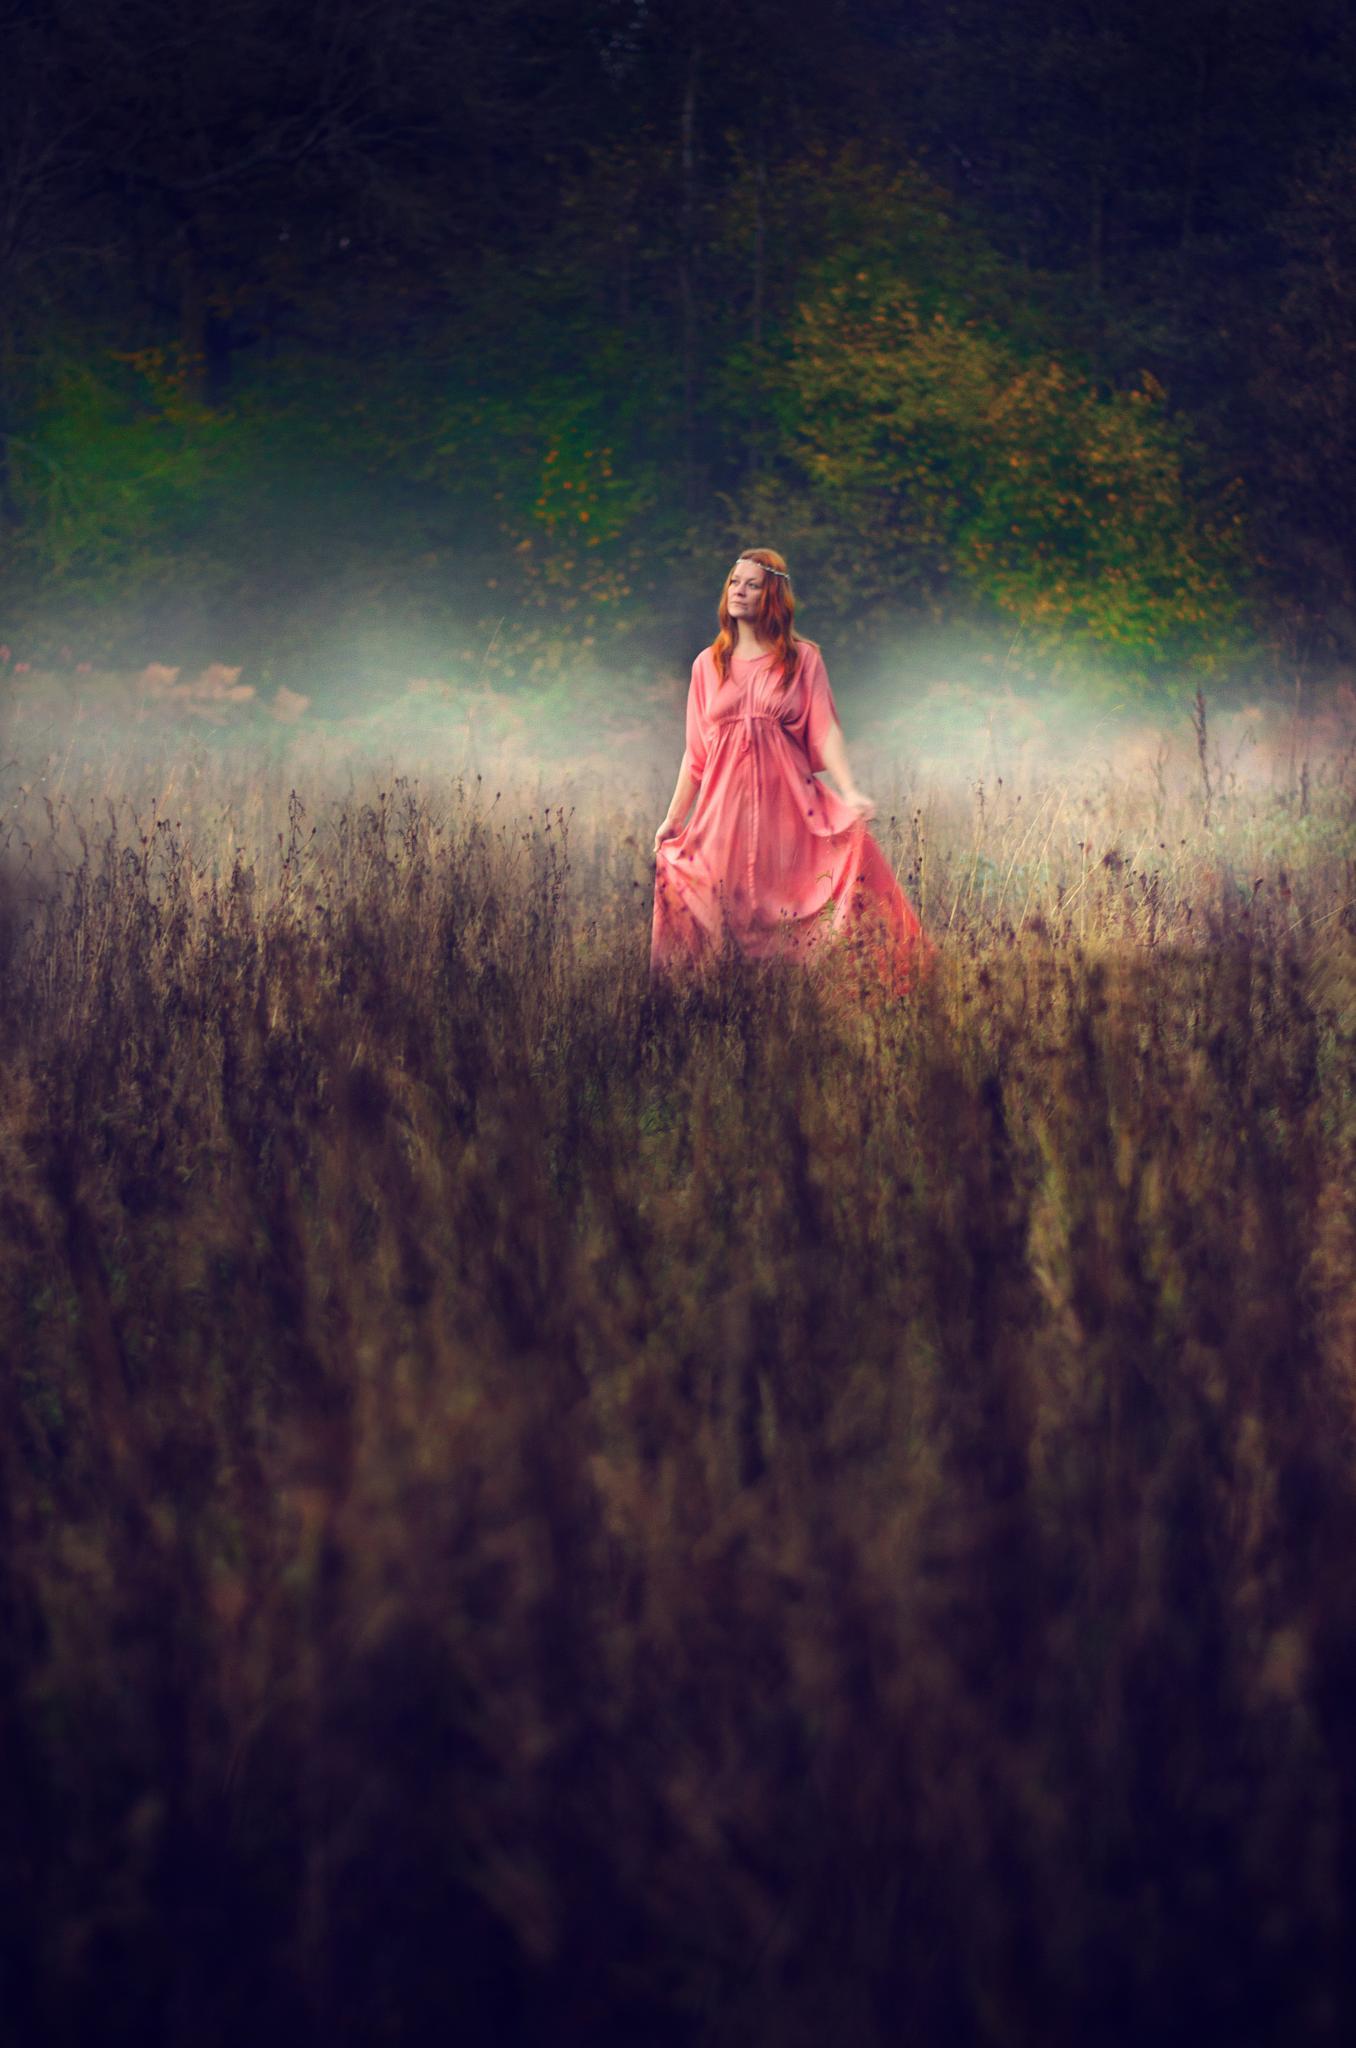 The Wanderer by KellyBird